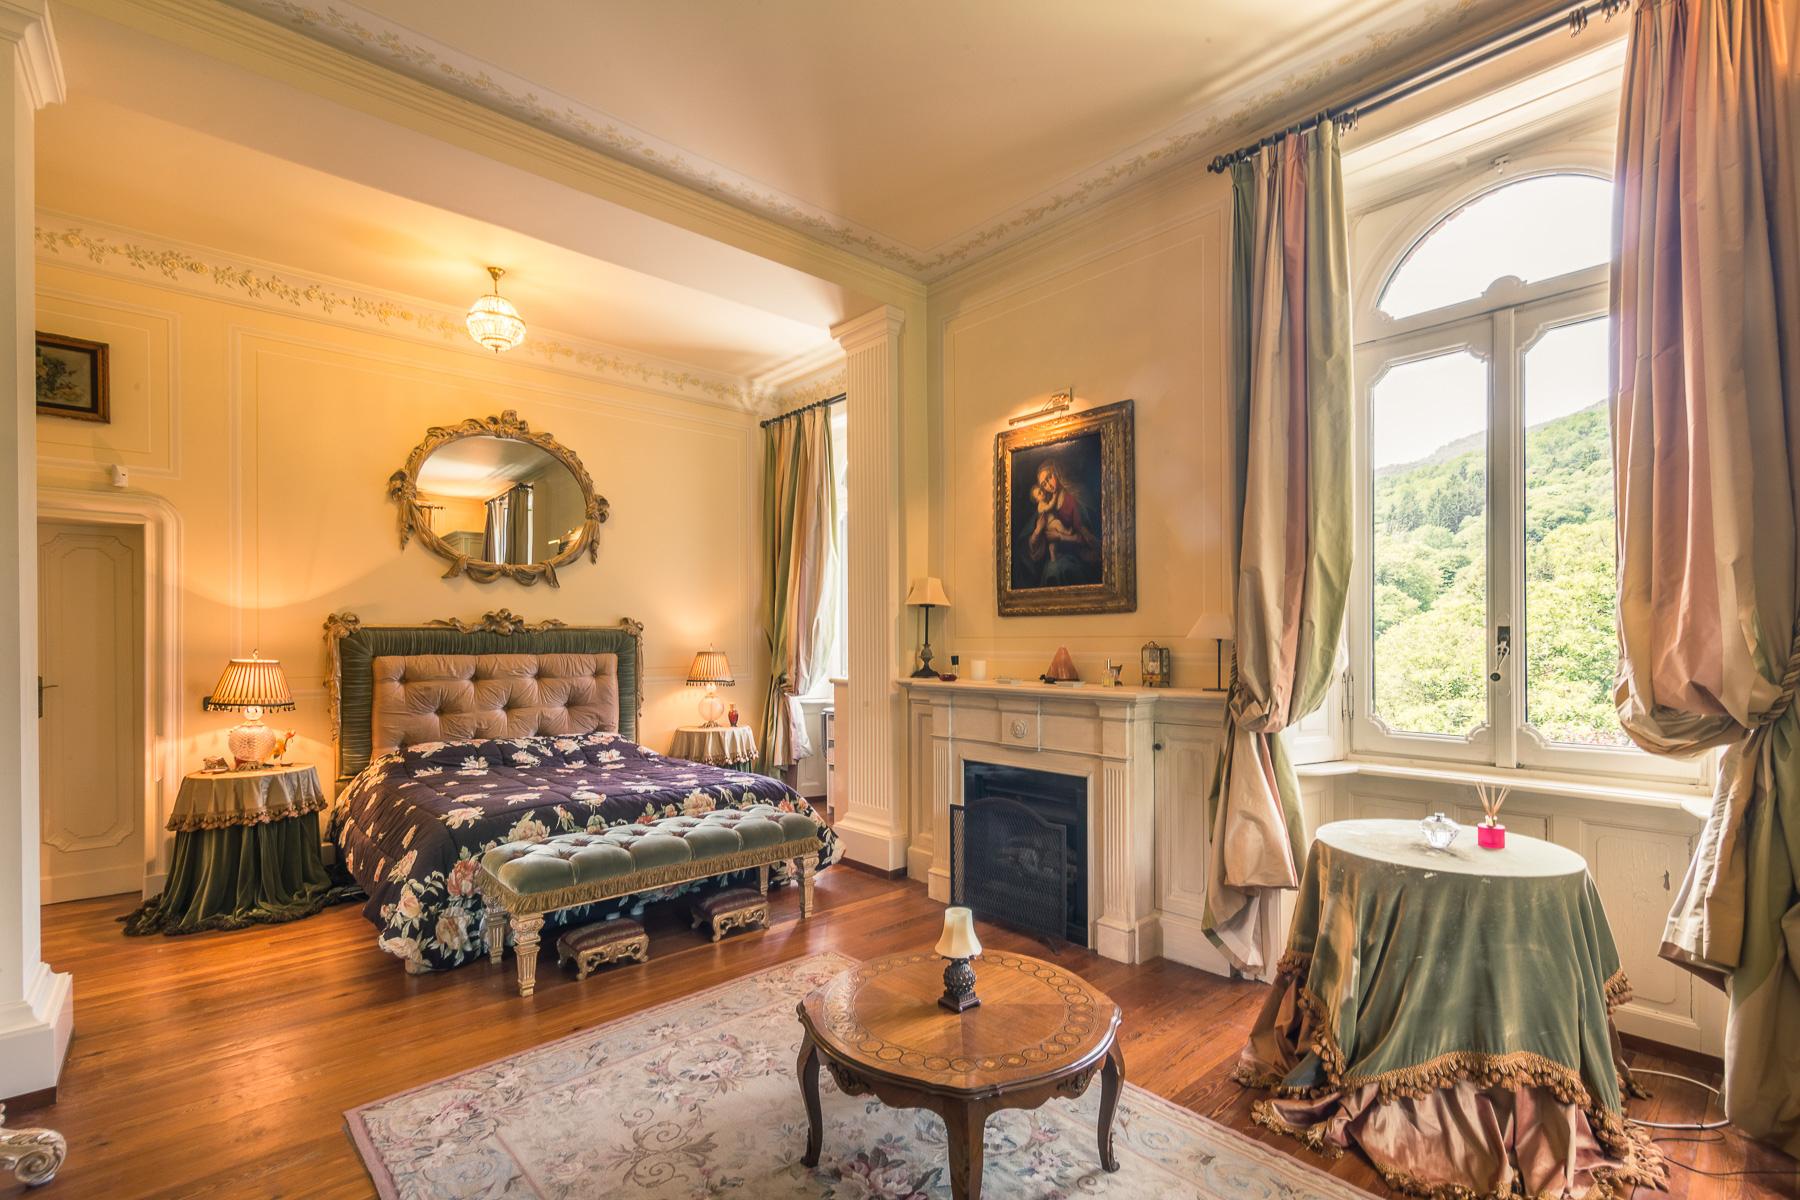 Villa in Vendita a Varese: 5 locali, 1150 mq - Foto 14